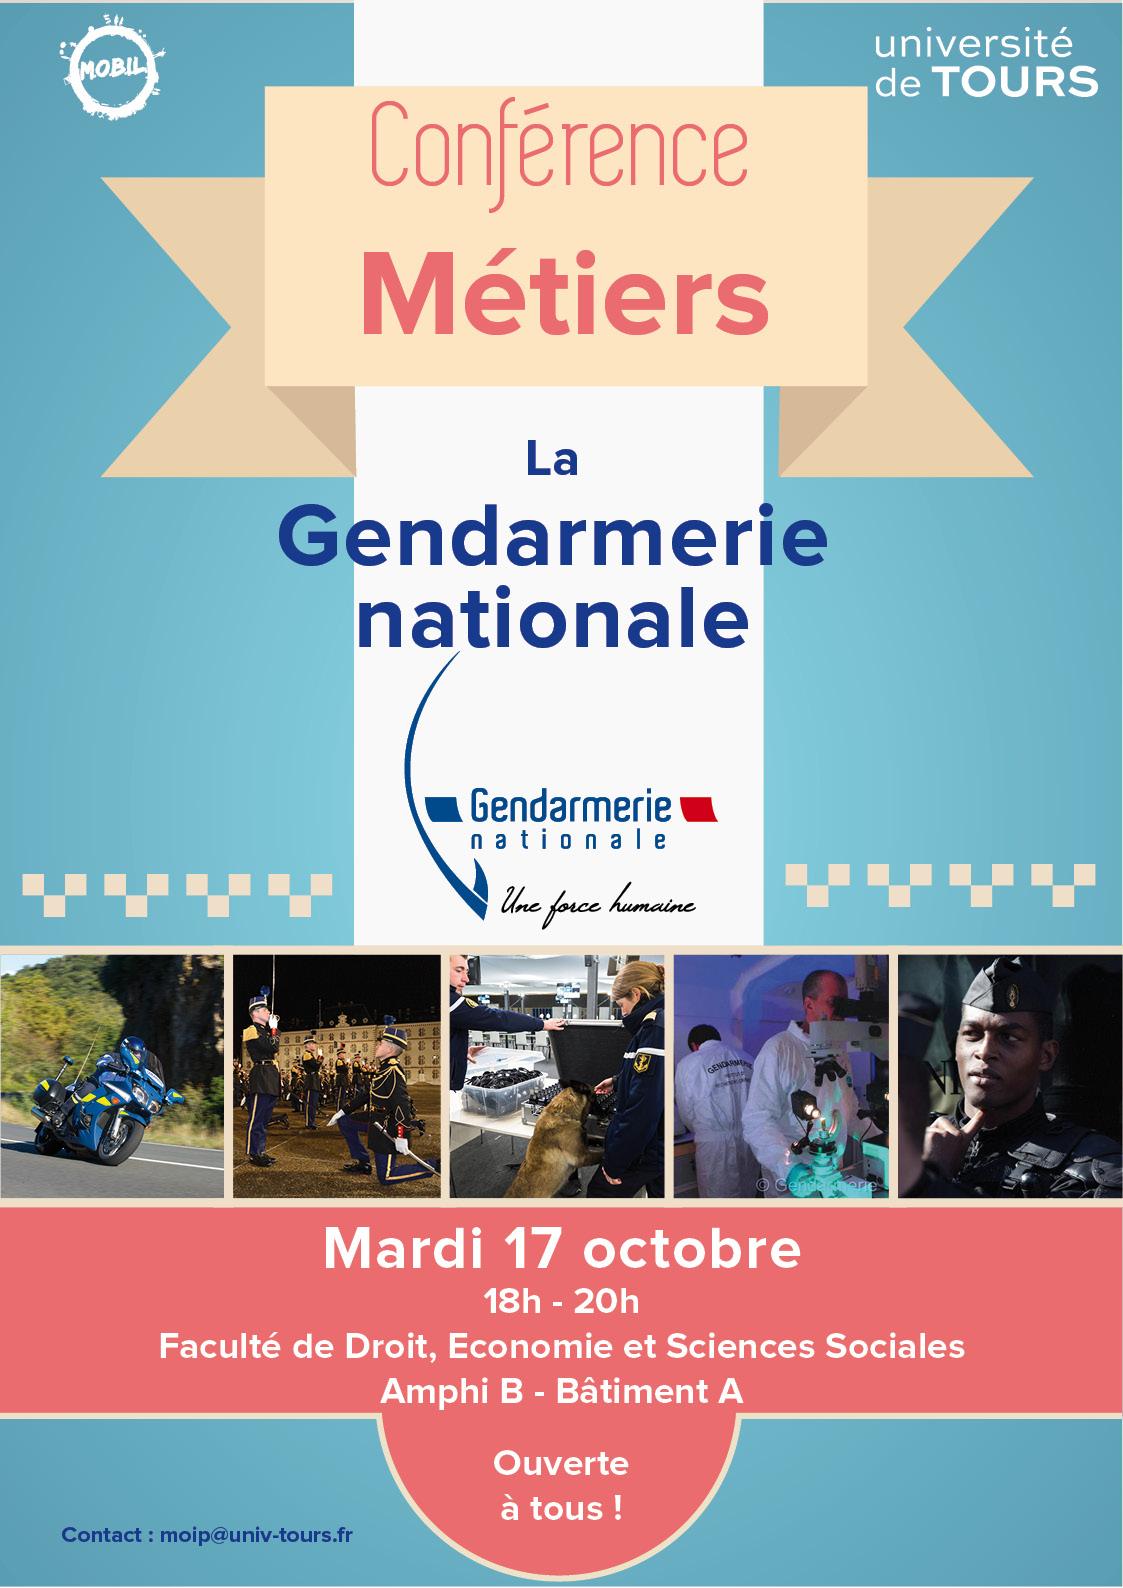 affiche-conference-gendarmerie-2017.jpg